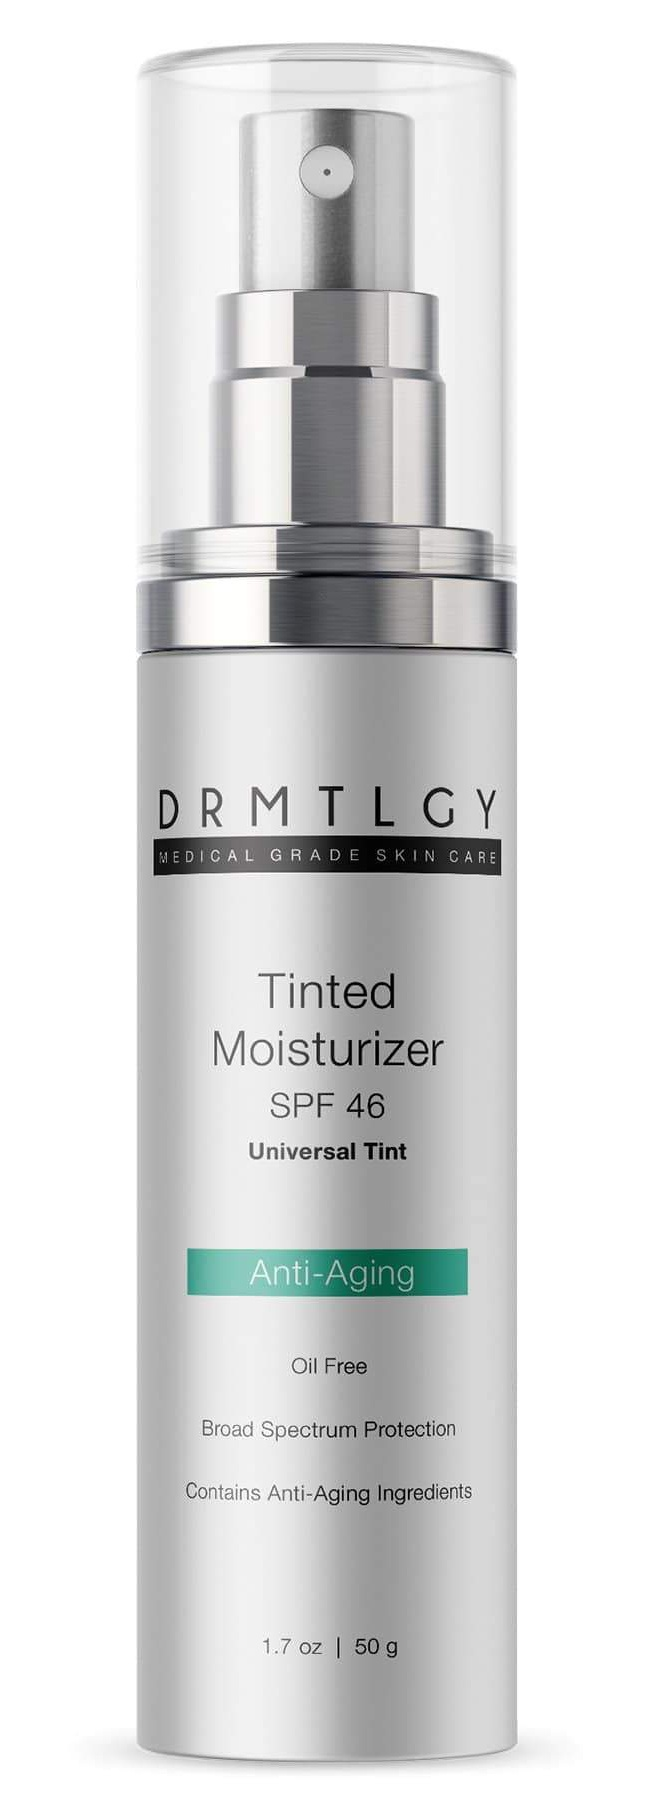 DRMTLGY Universal Tinted Moisturizer Spf 46